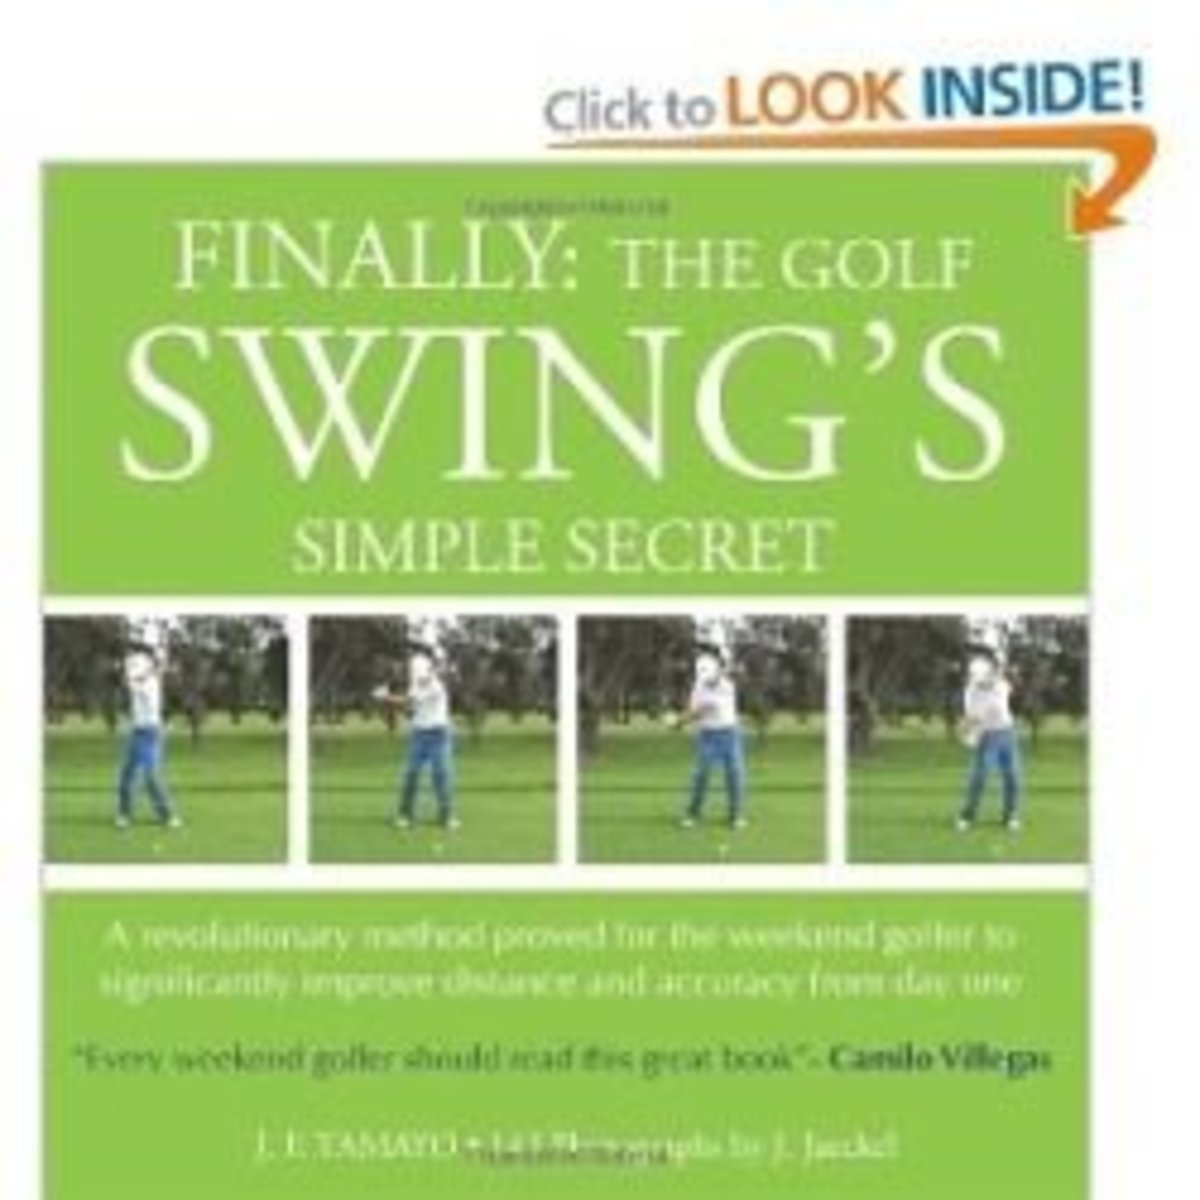 Great Golf Ideas For Men